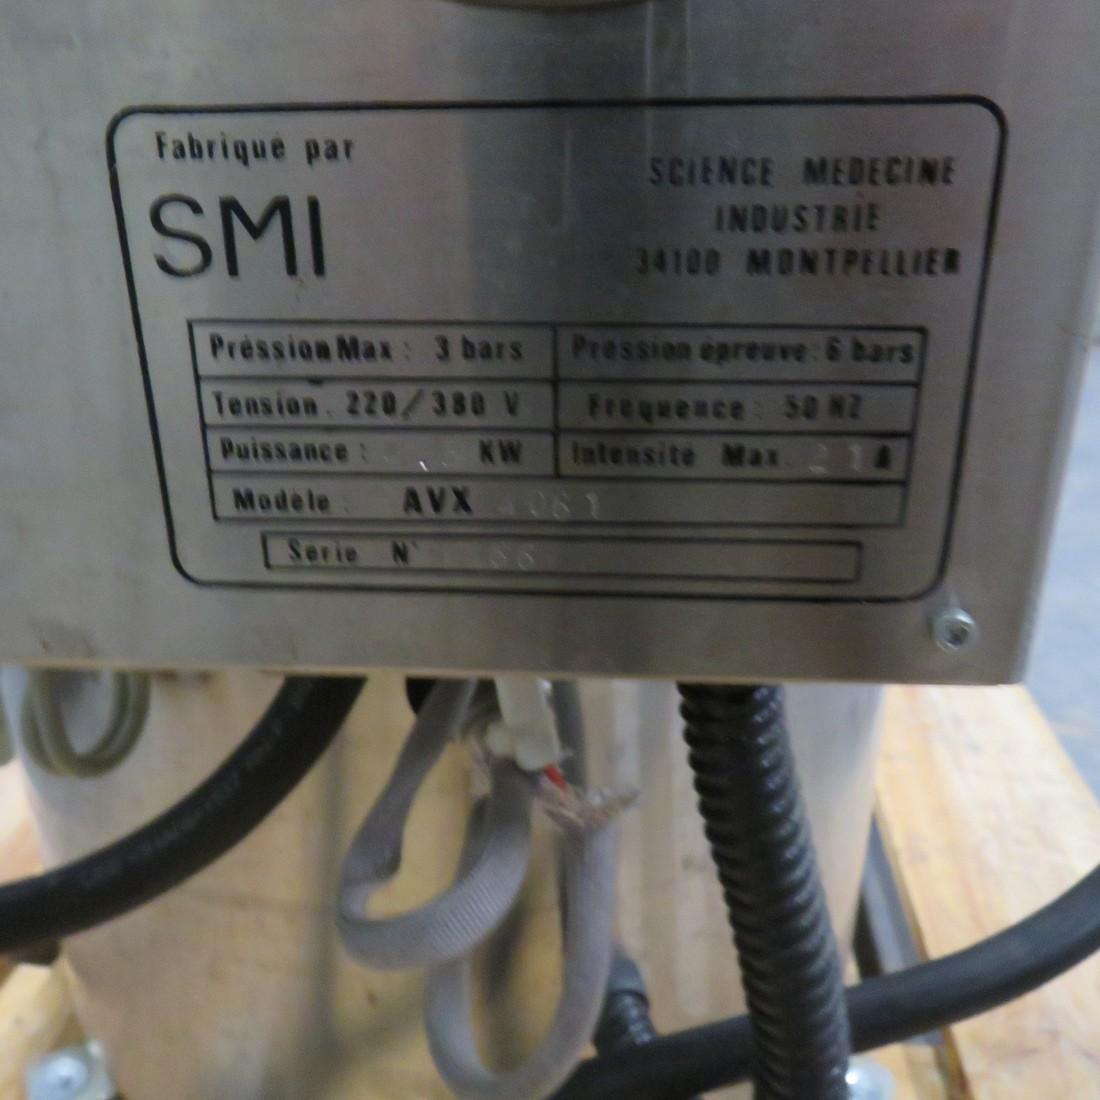 R1B736 SMI electric Autoclave